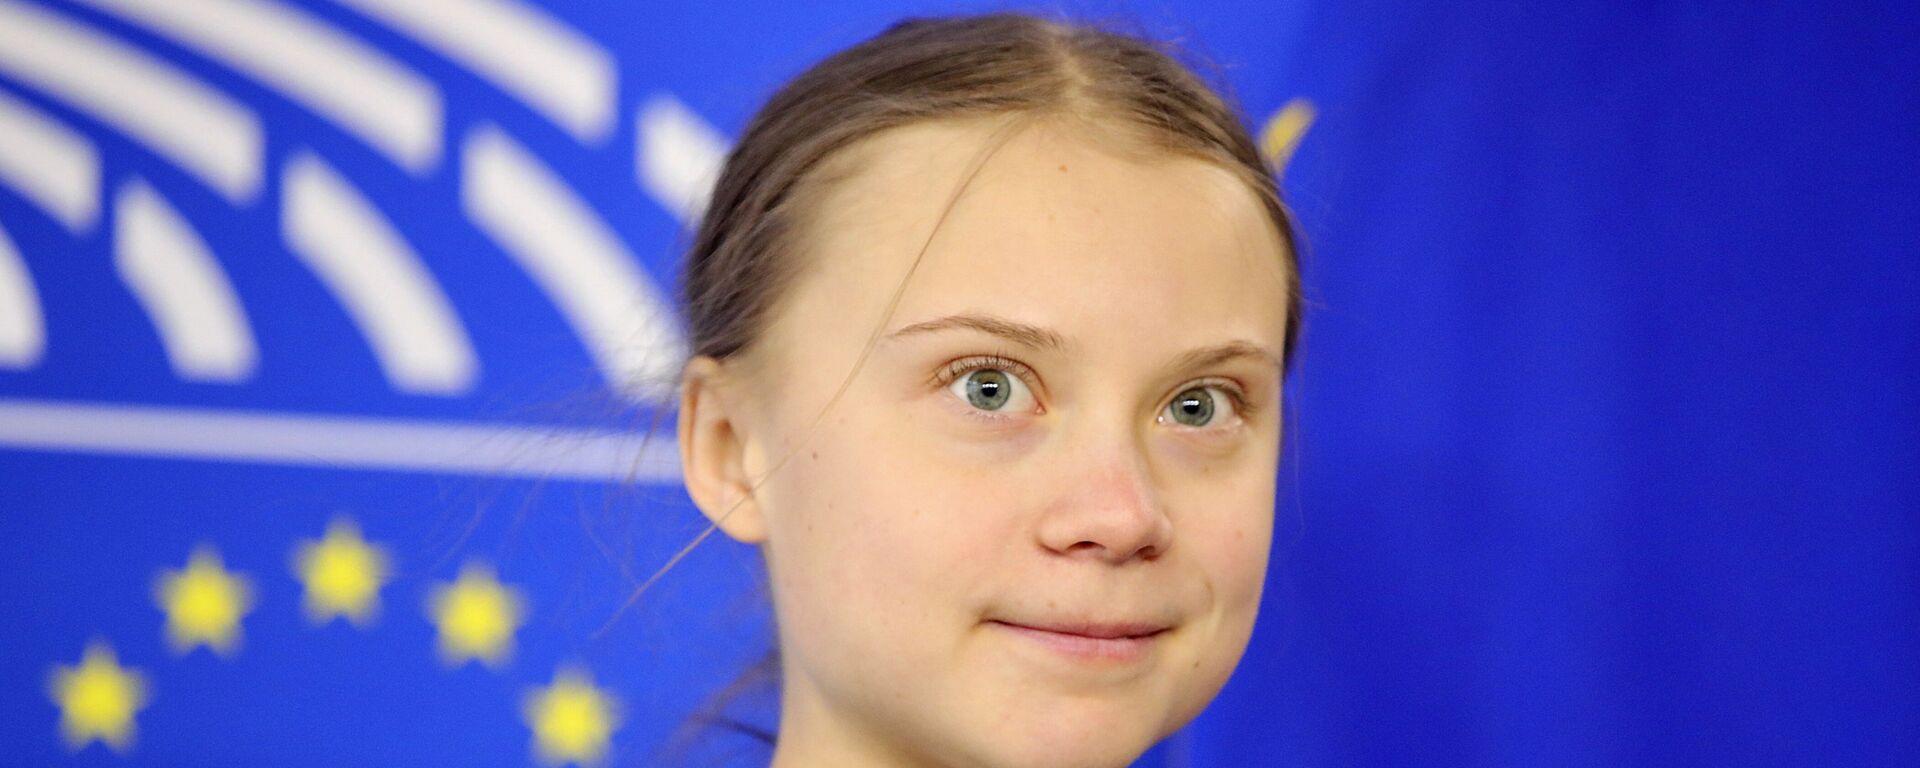 Greta Thunberg - Sputnik Türkiye, 1920, 23.04.2021